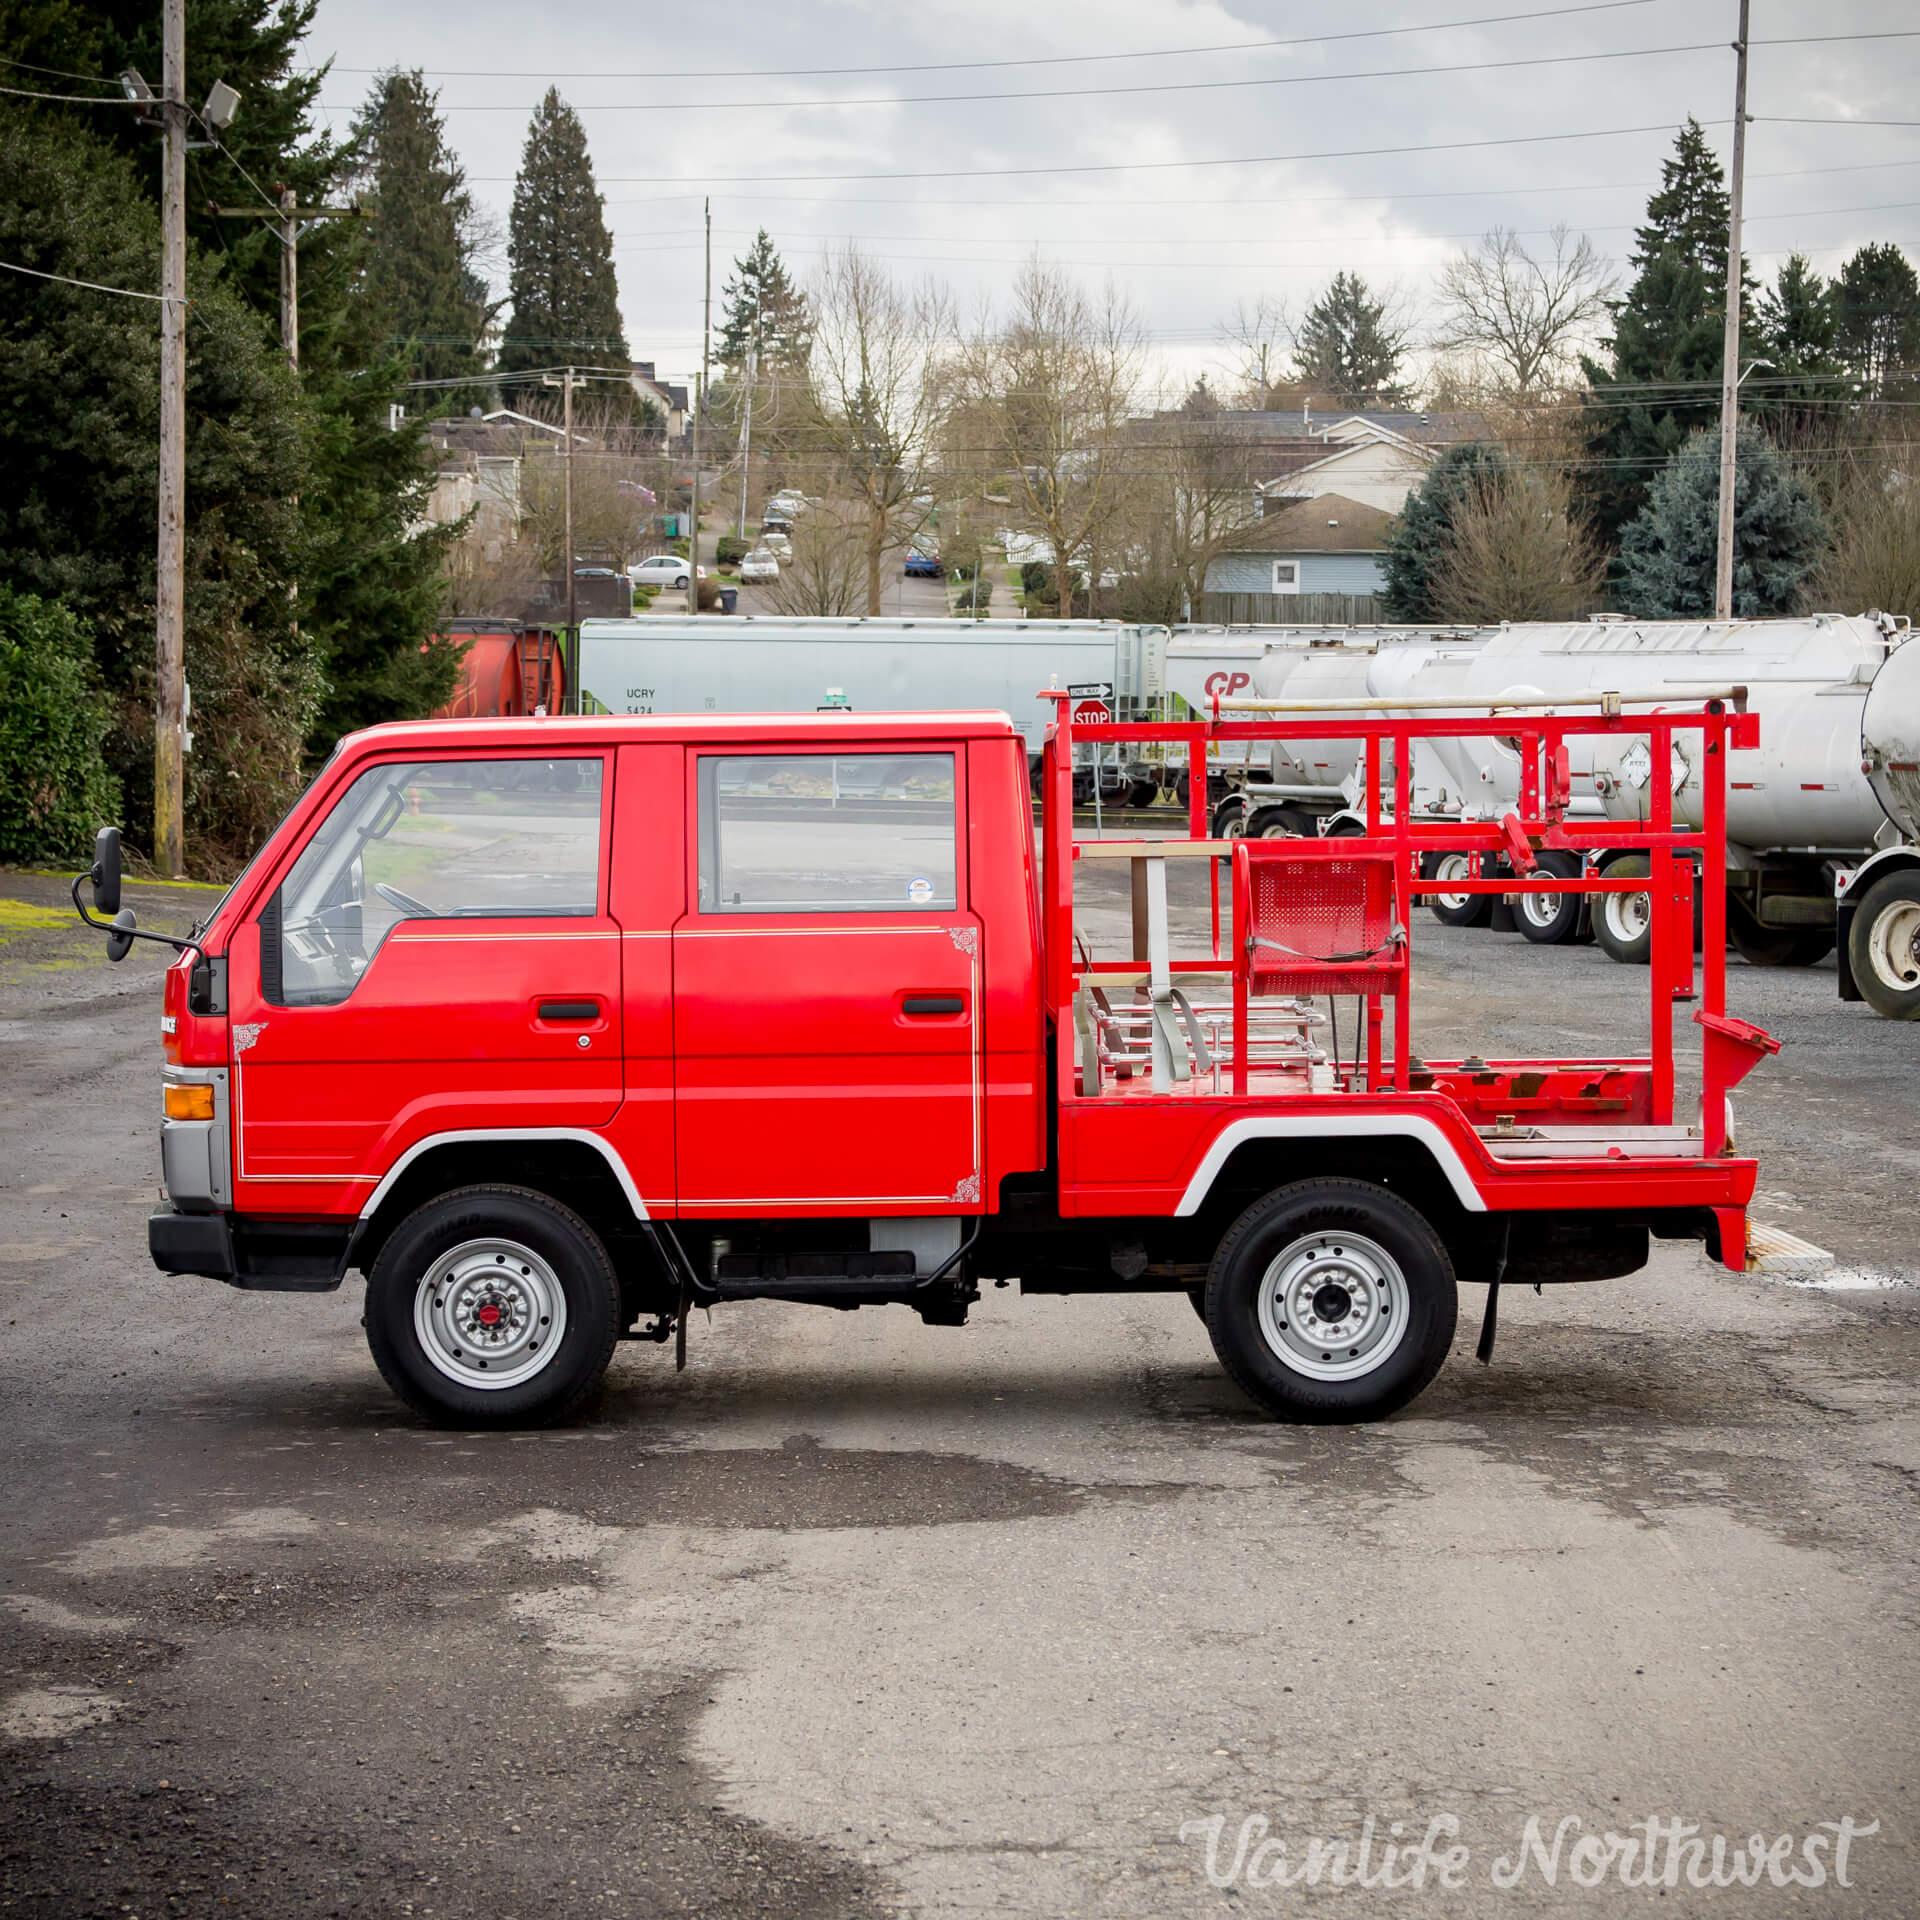 ToyotaHiaceFireTruckLH851990-13.jpg